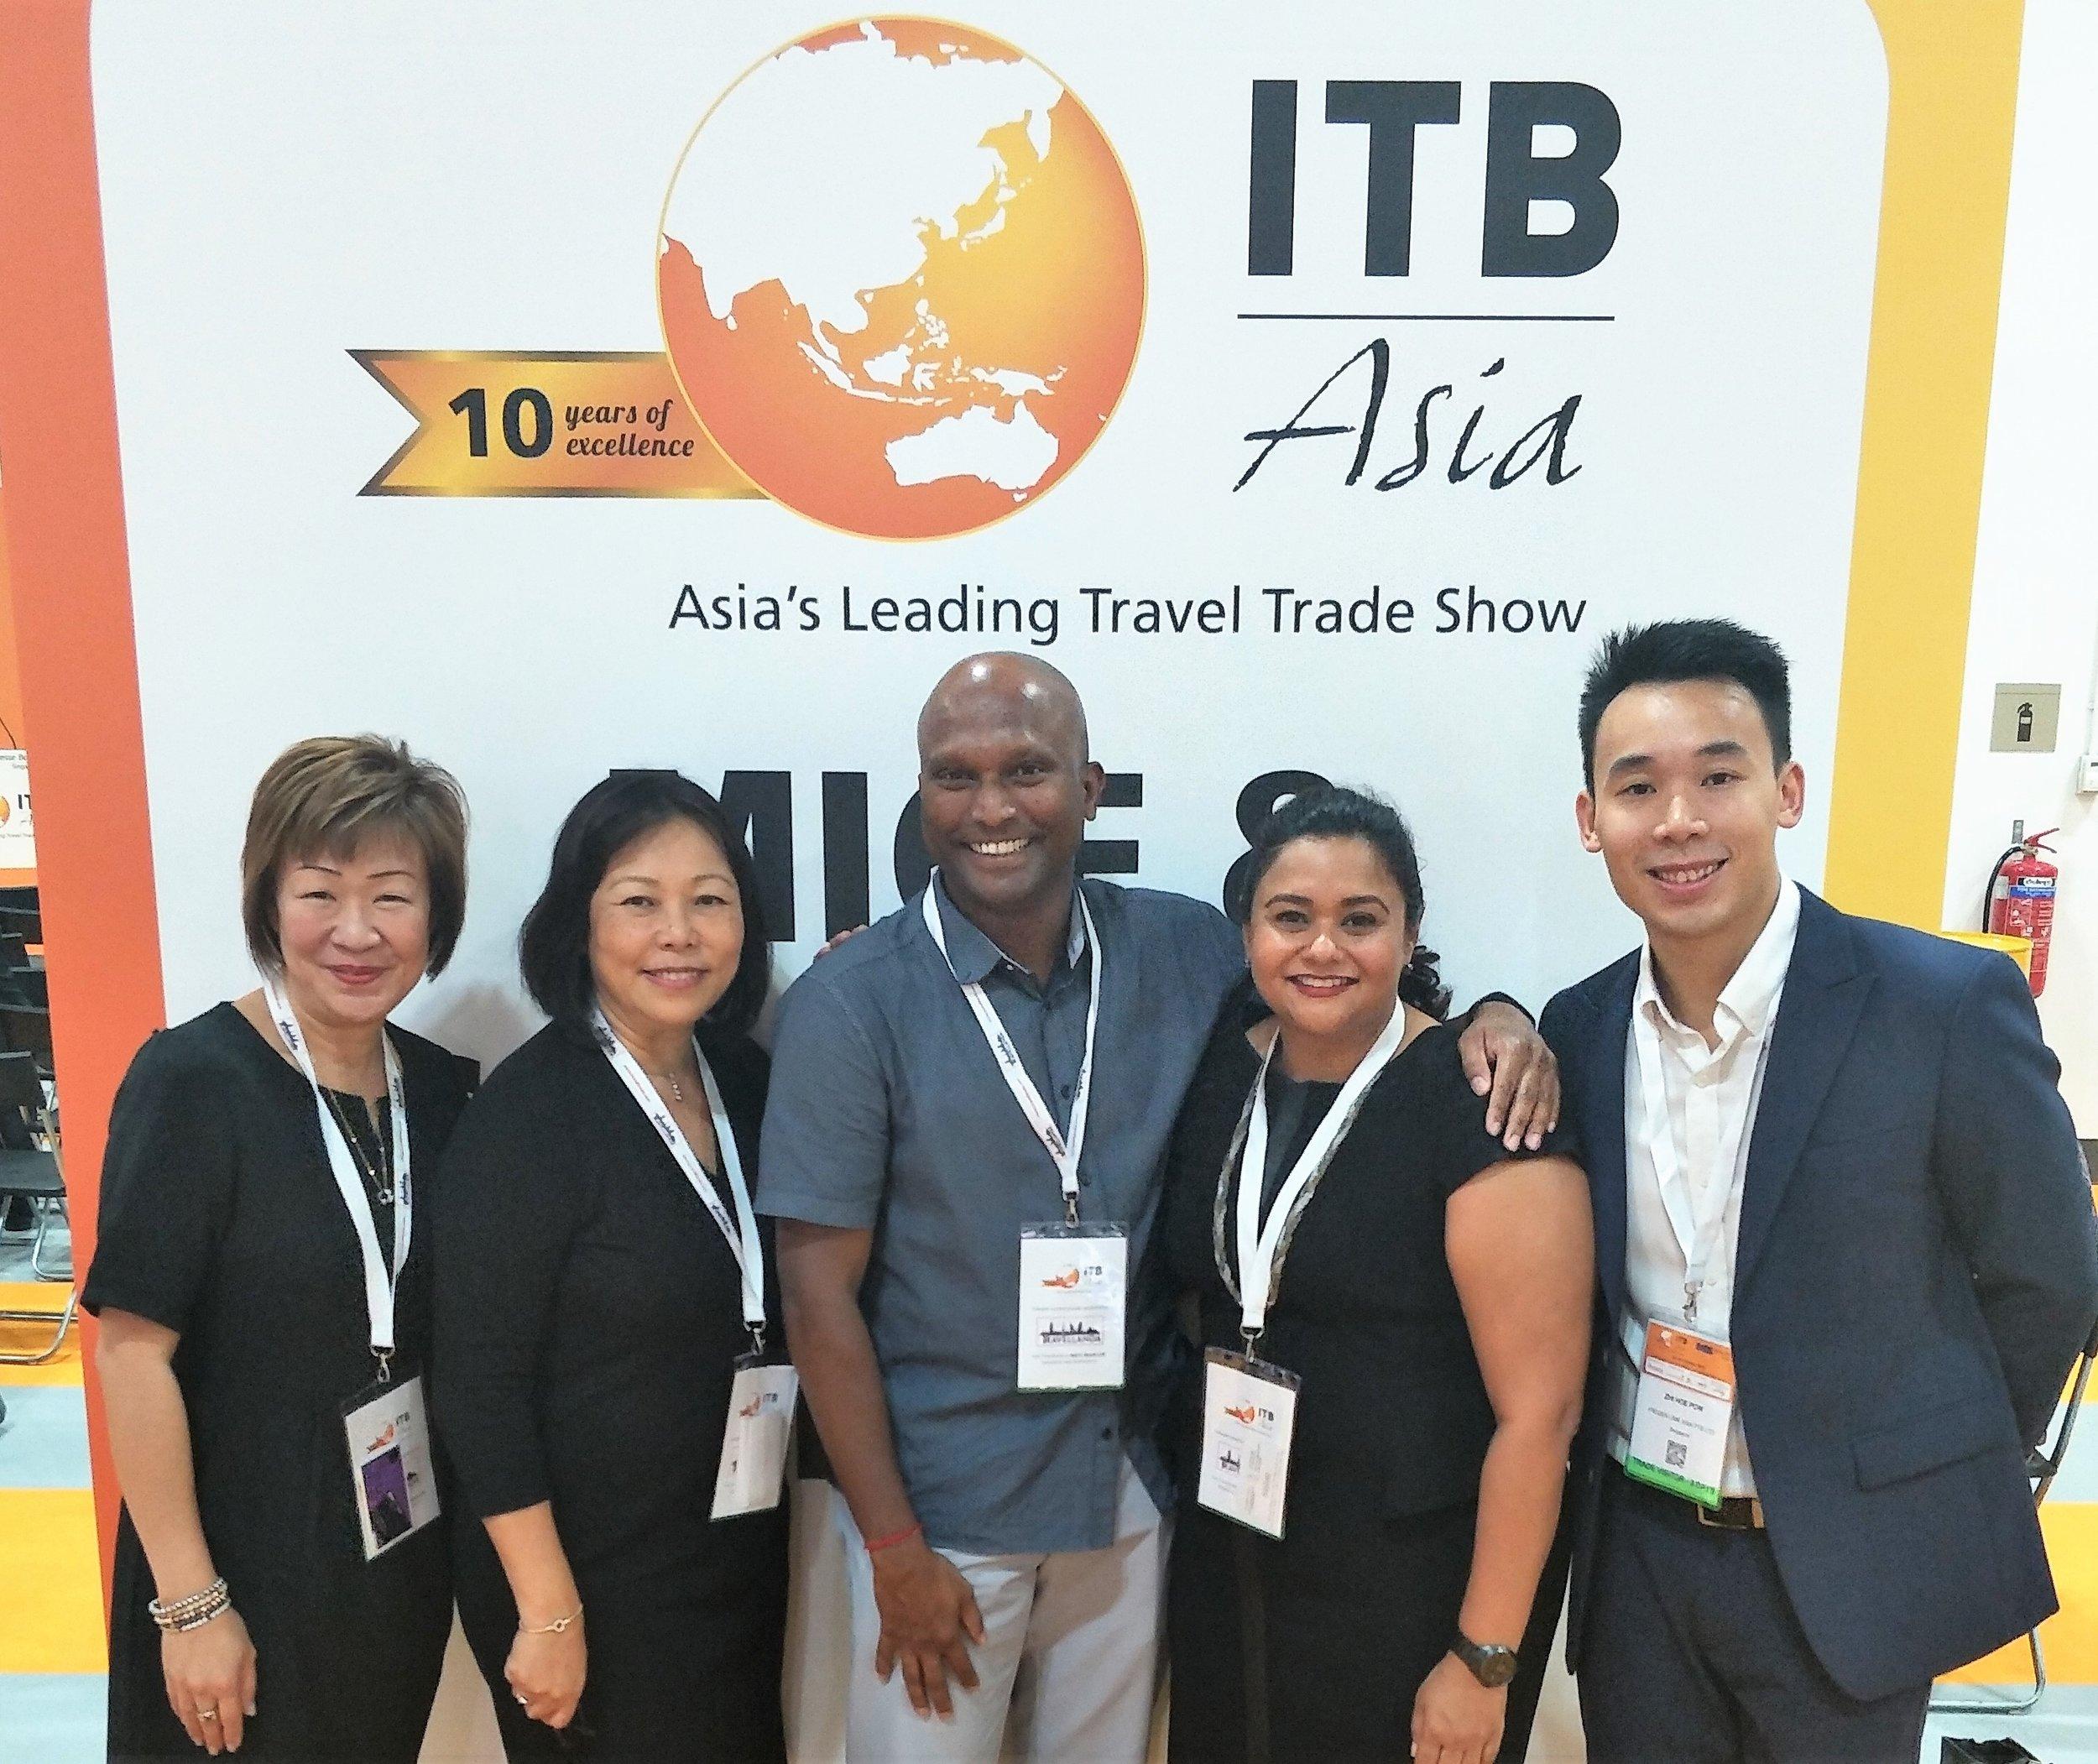 From left to right:  Ms Aileene Thangaveloo (Director - Marketing, FLA), Ms Serene Law (VP, FLA), Mr Christy Guna Desa (General Manager, The Damai Bali), Ms Jagdish Sandhu (CEO, FLA), Mr Pow Zhi Hoe (Asst Sales Manager, FLA).